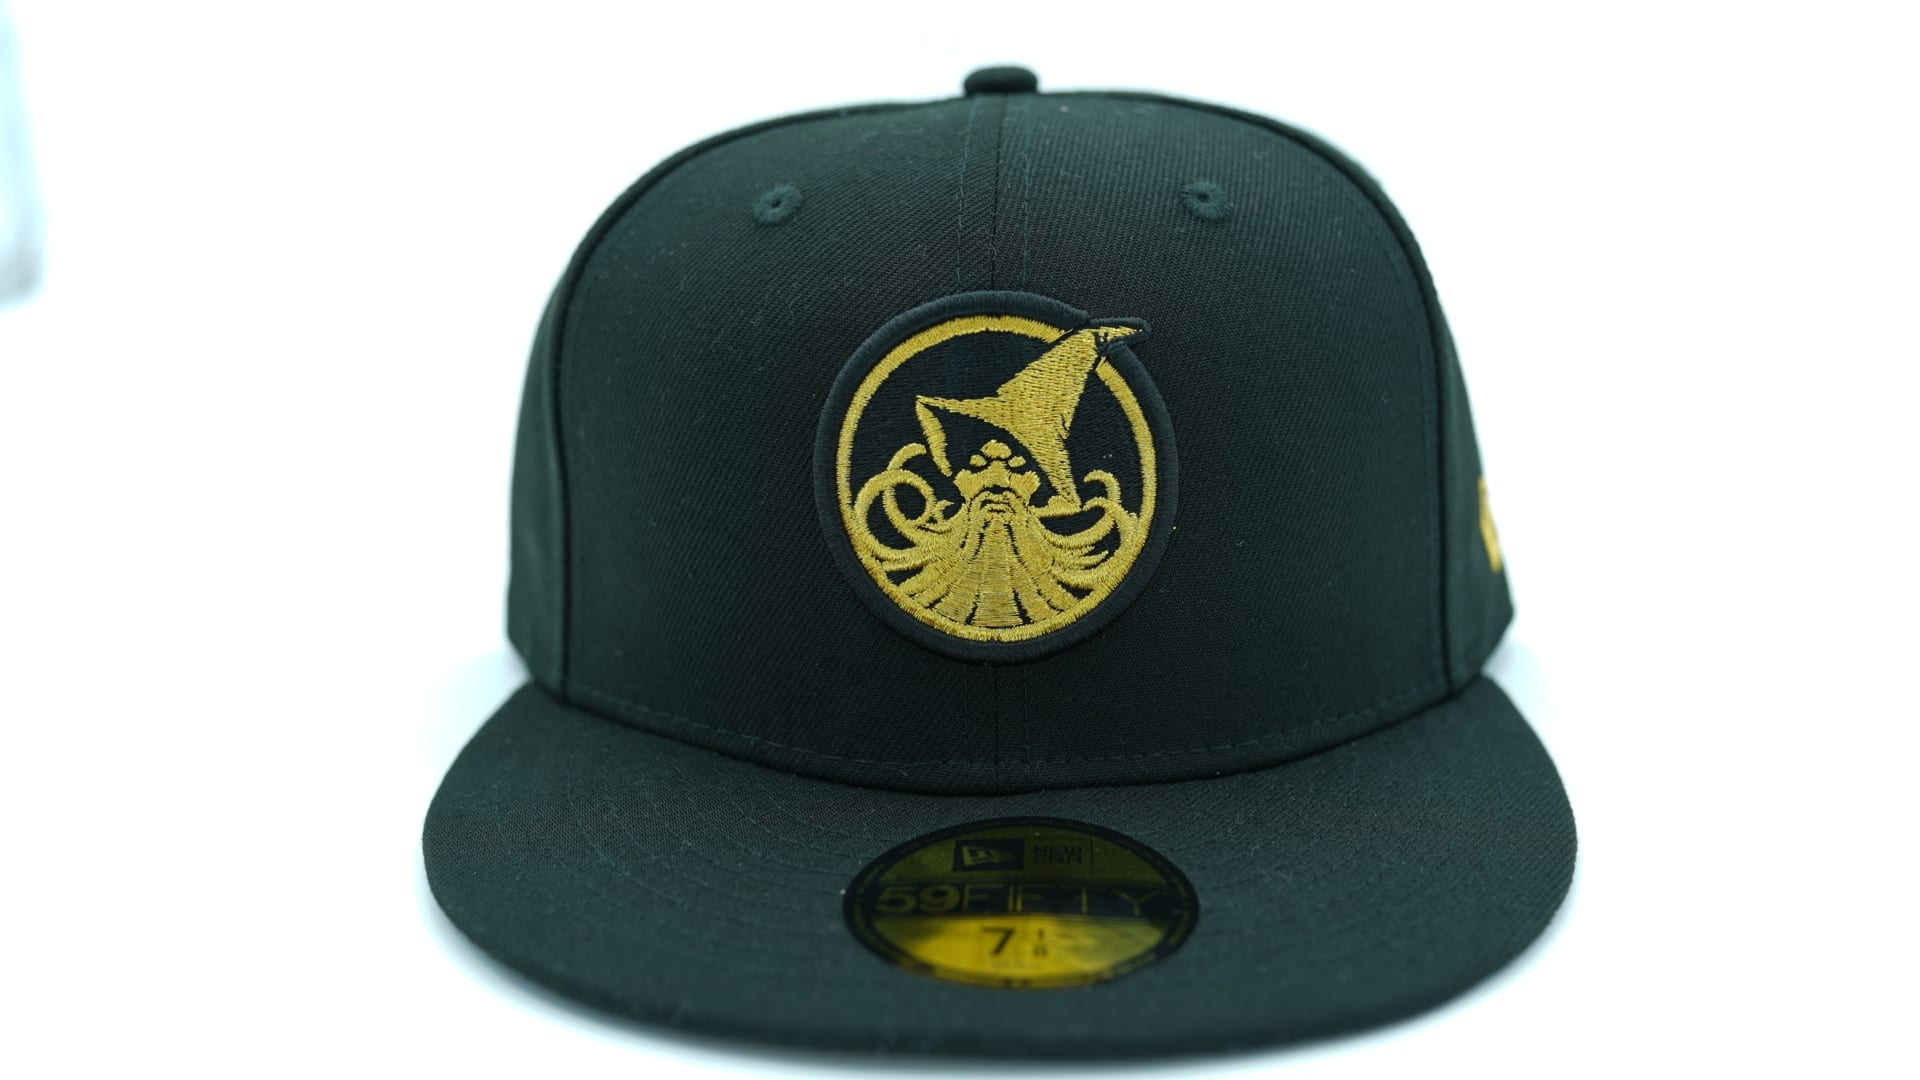 new york yankees 2009 world series pin 59fifty fitted baseball cap new era mlb 1